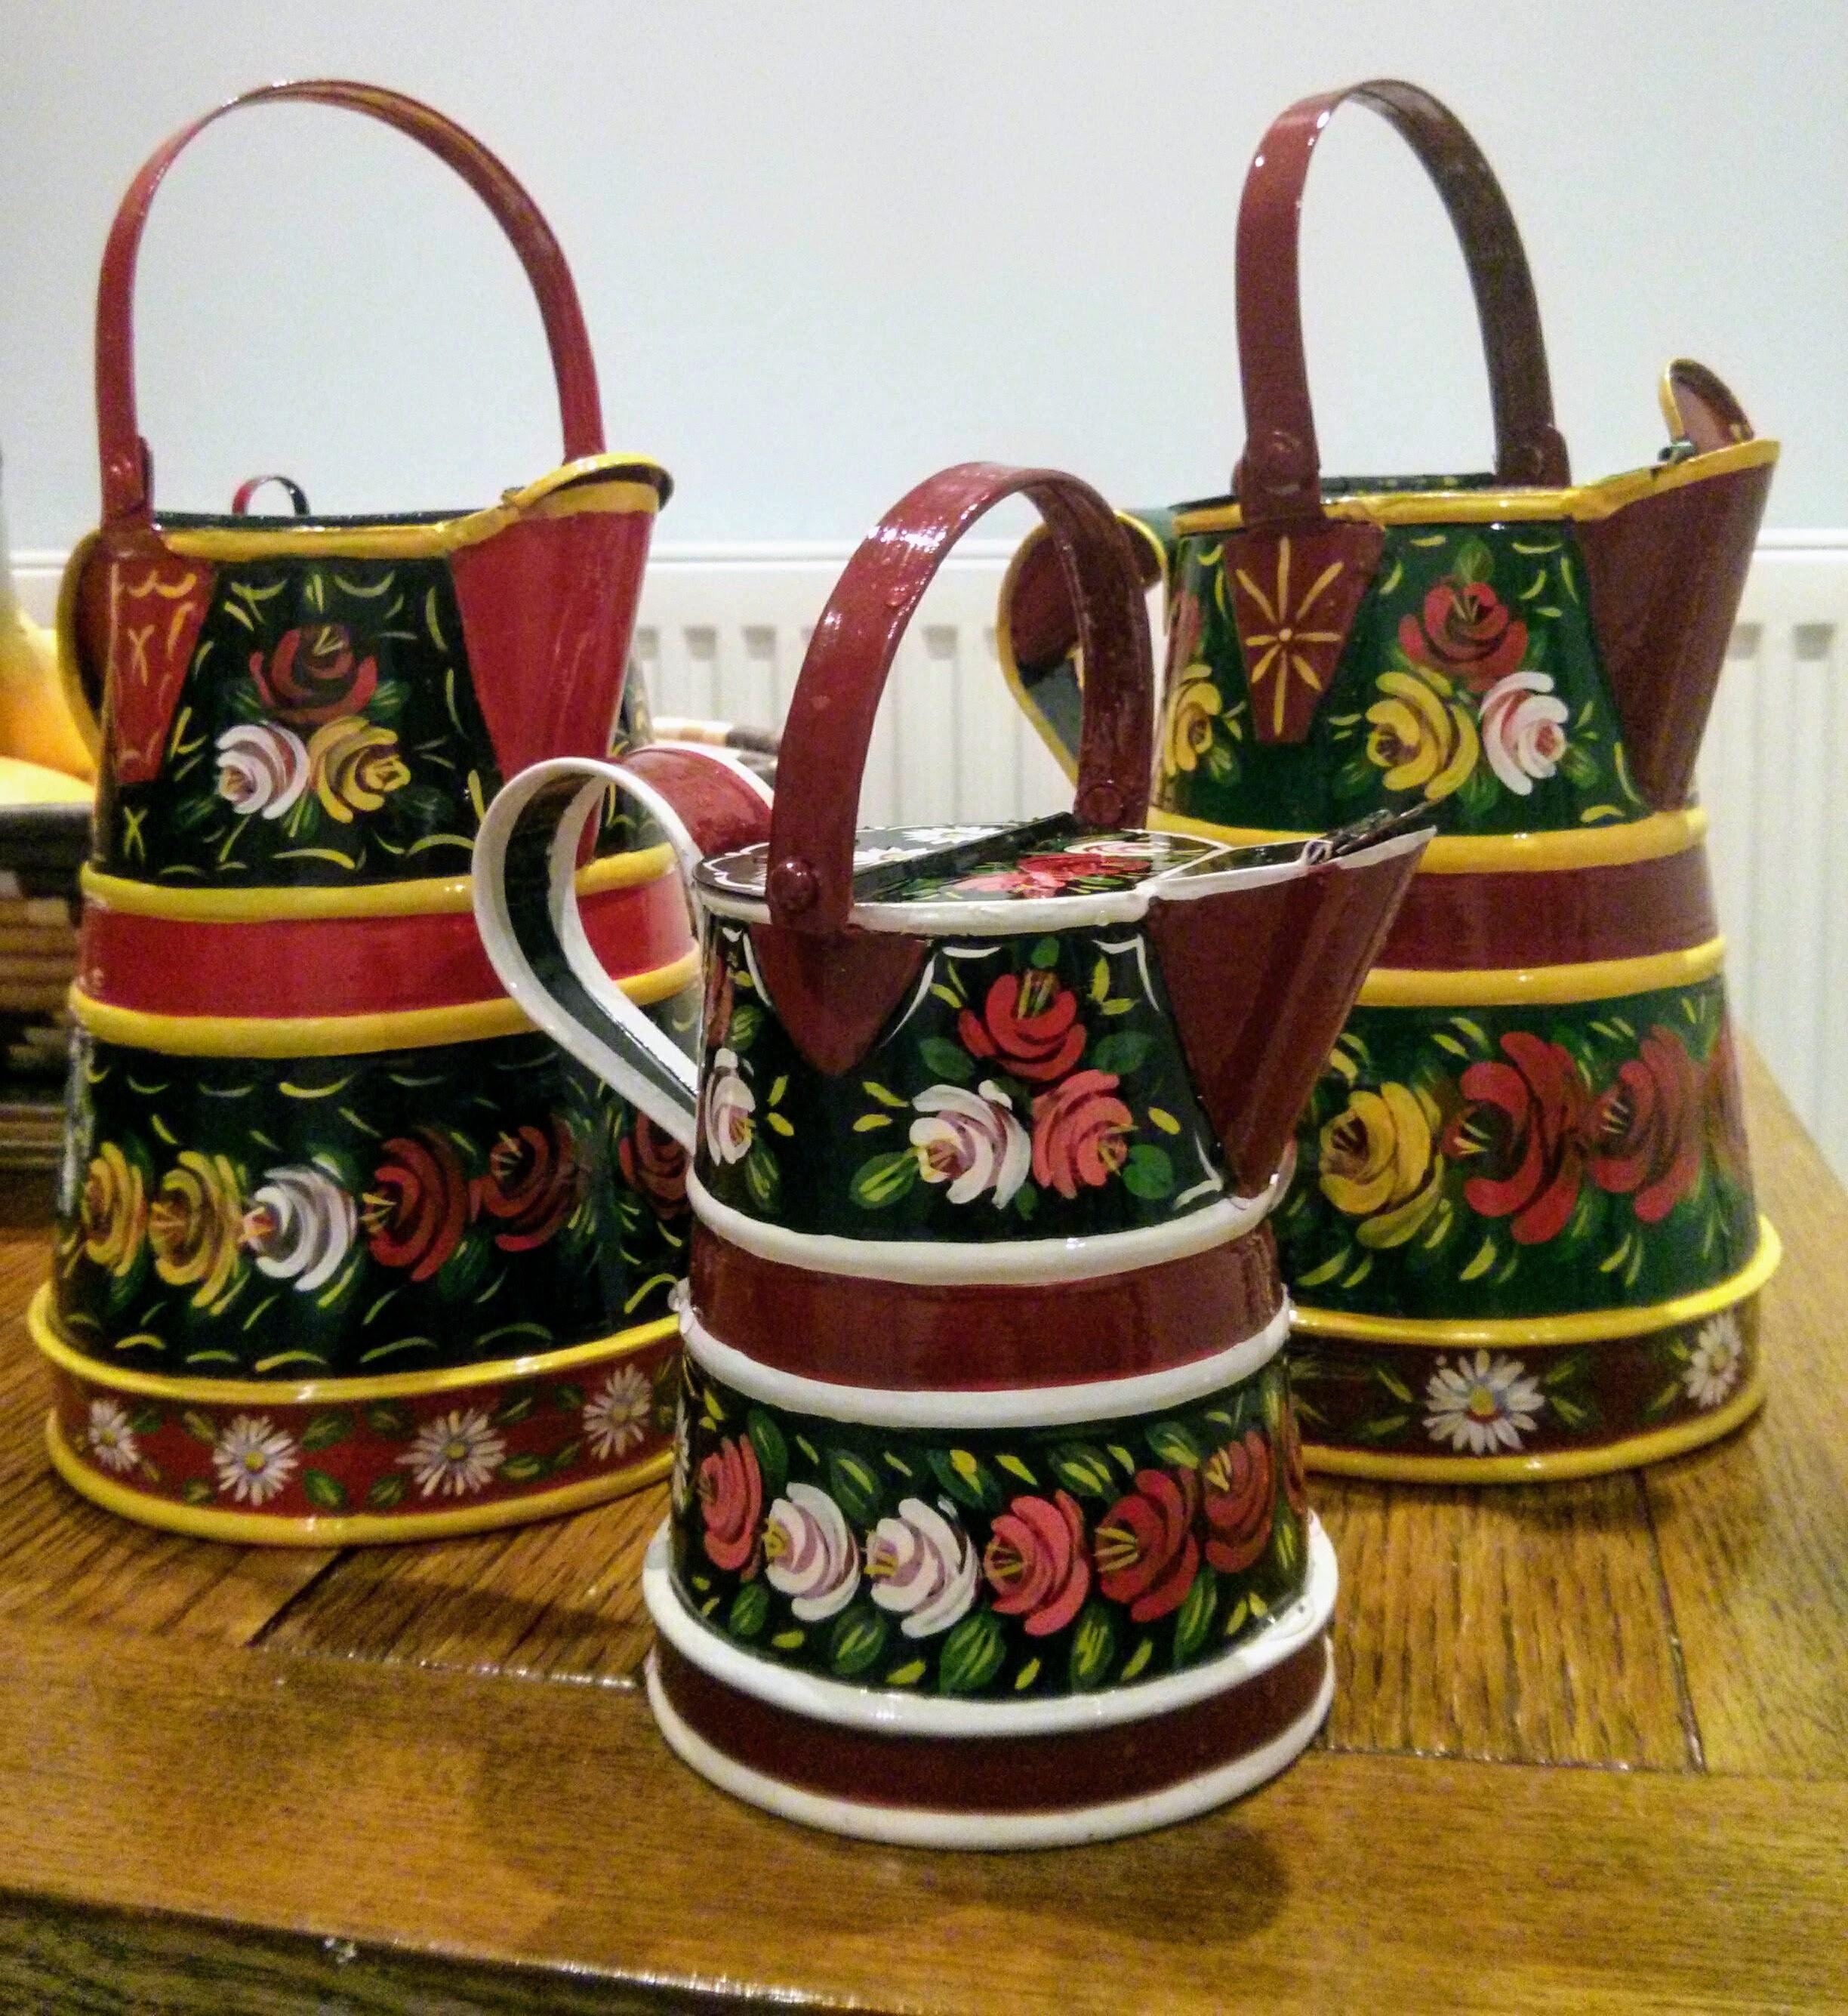 bucbky cans, canalart, handpainted, roses, narrowboat